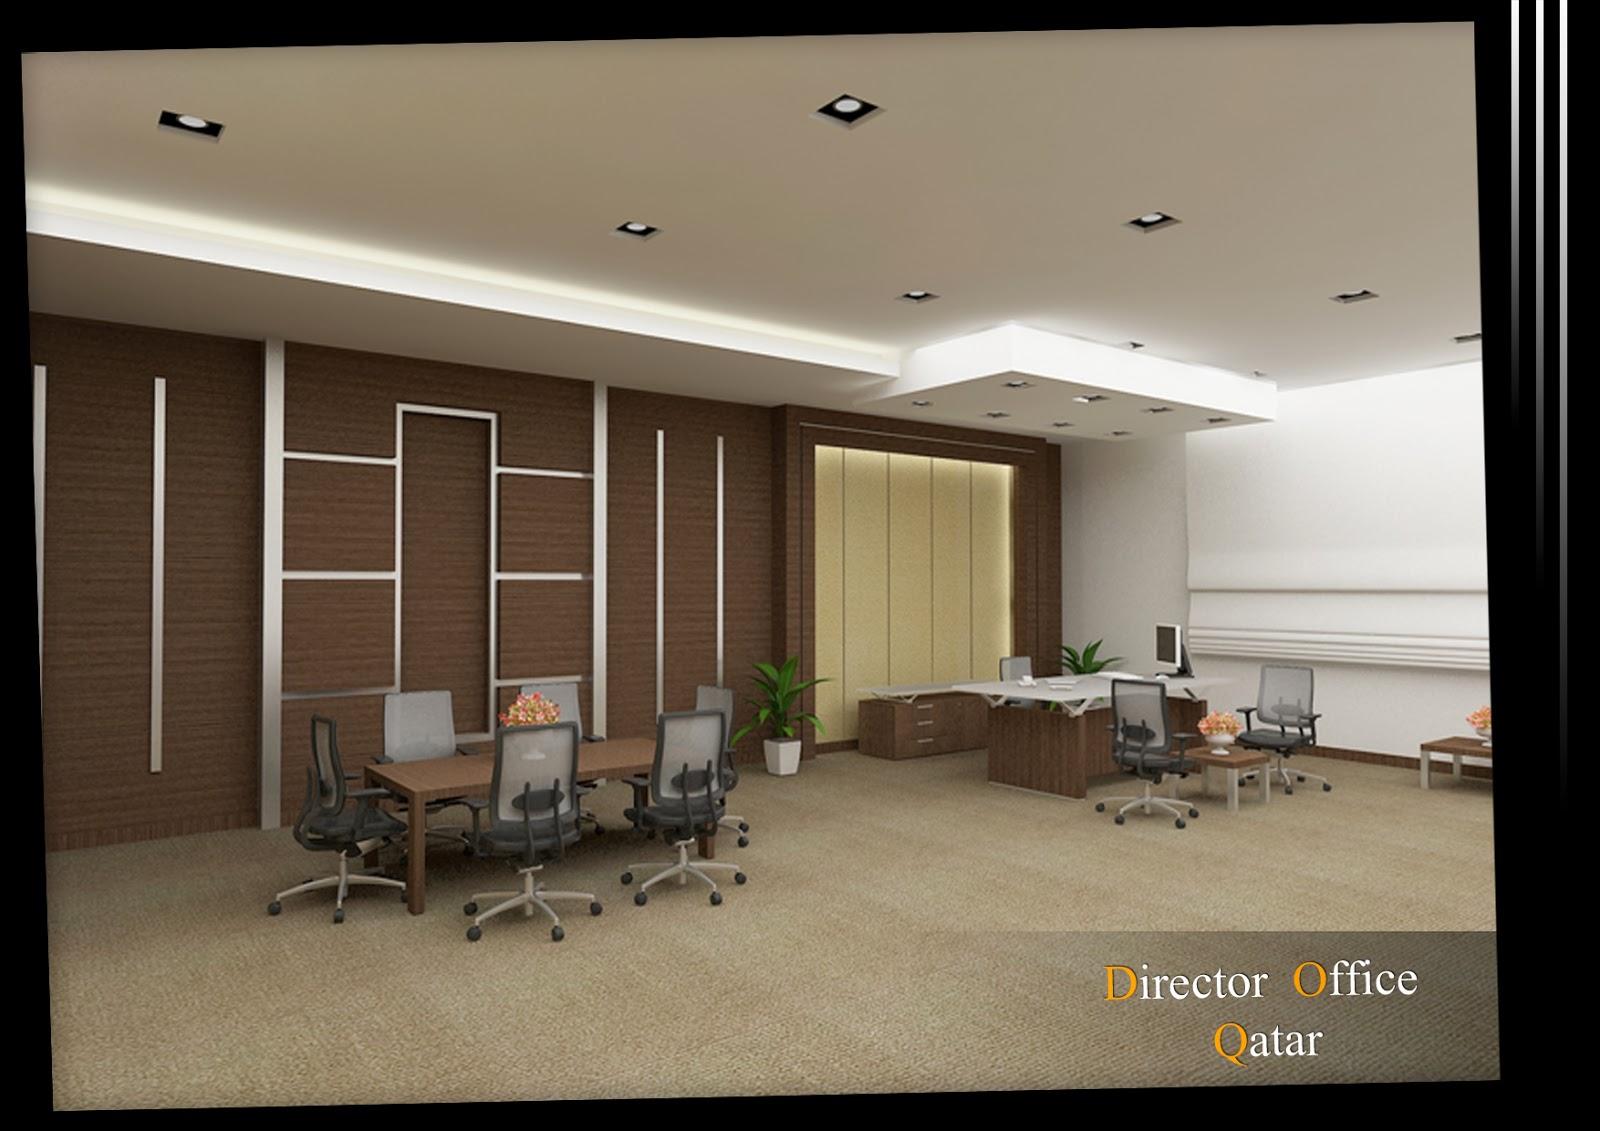 Arch michael boules interior design for director office for Director office interior design